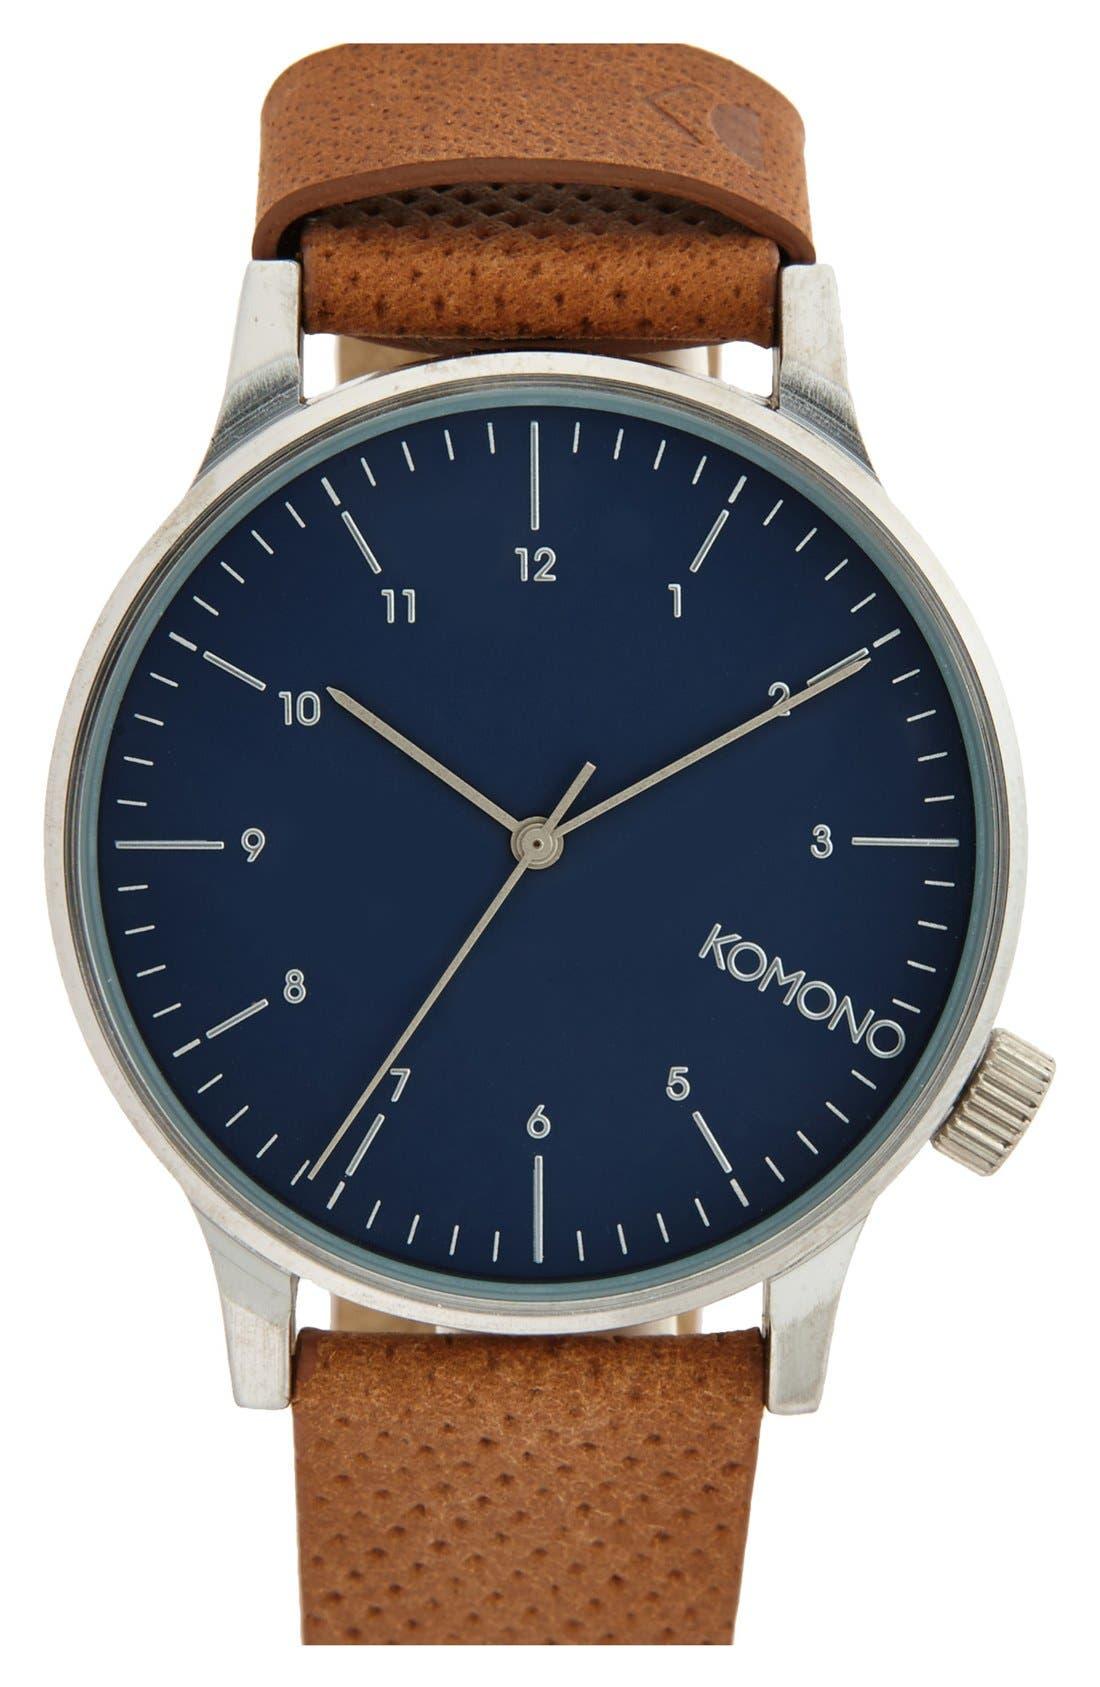 Main Image - Komono 'Winston' Round Dial Leather Strap Watch, 41mm